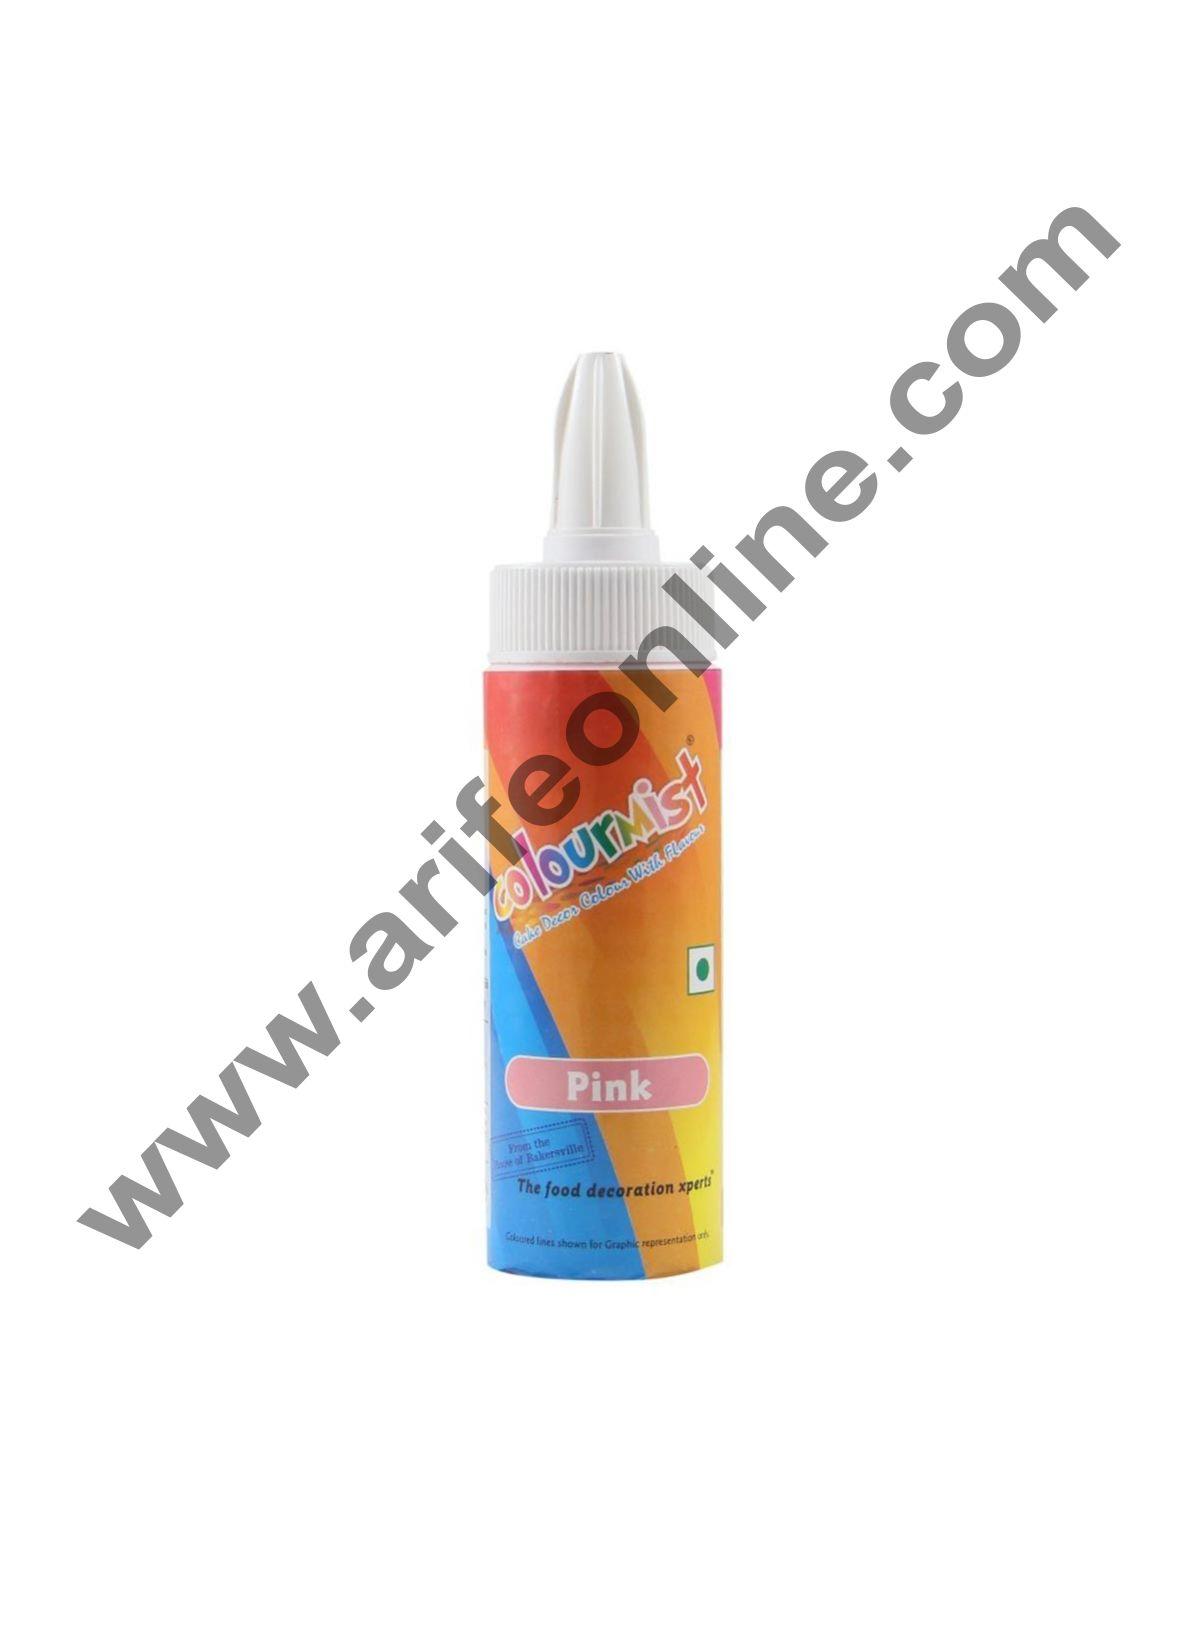 Colourmist Powder Spray (Pink), 60gm